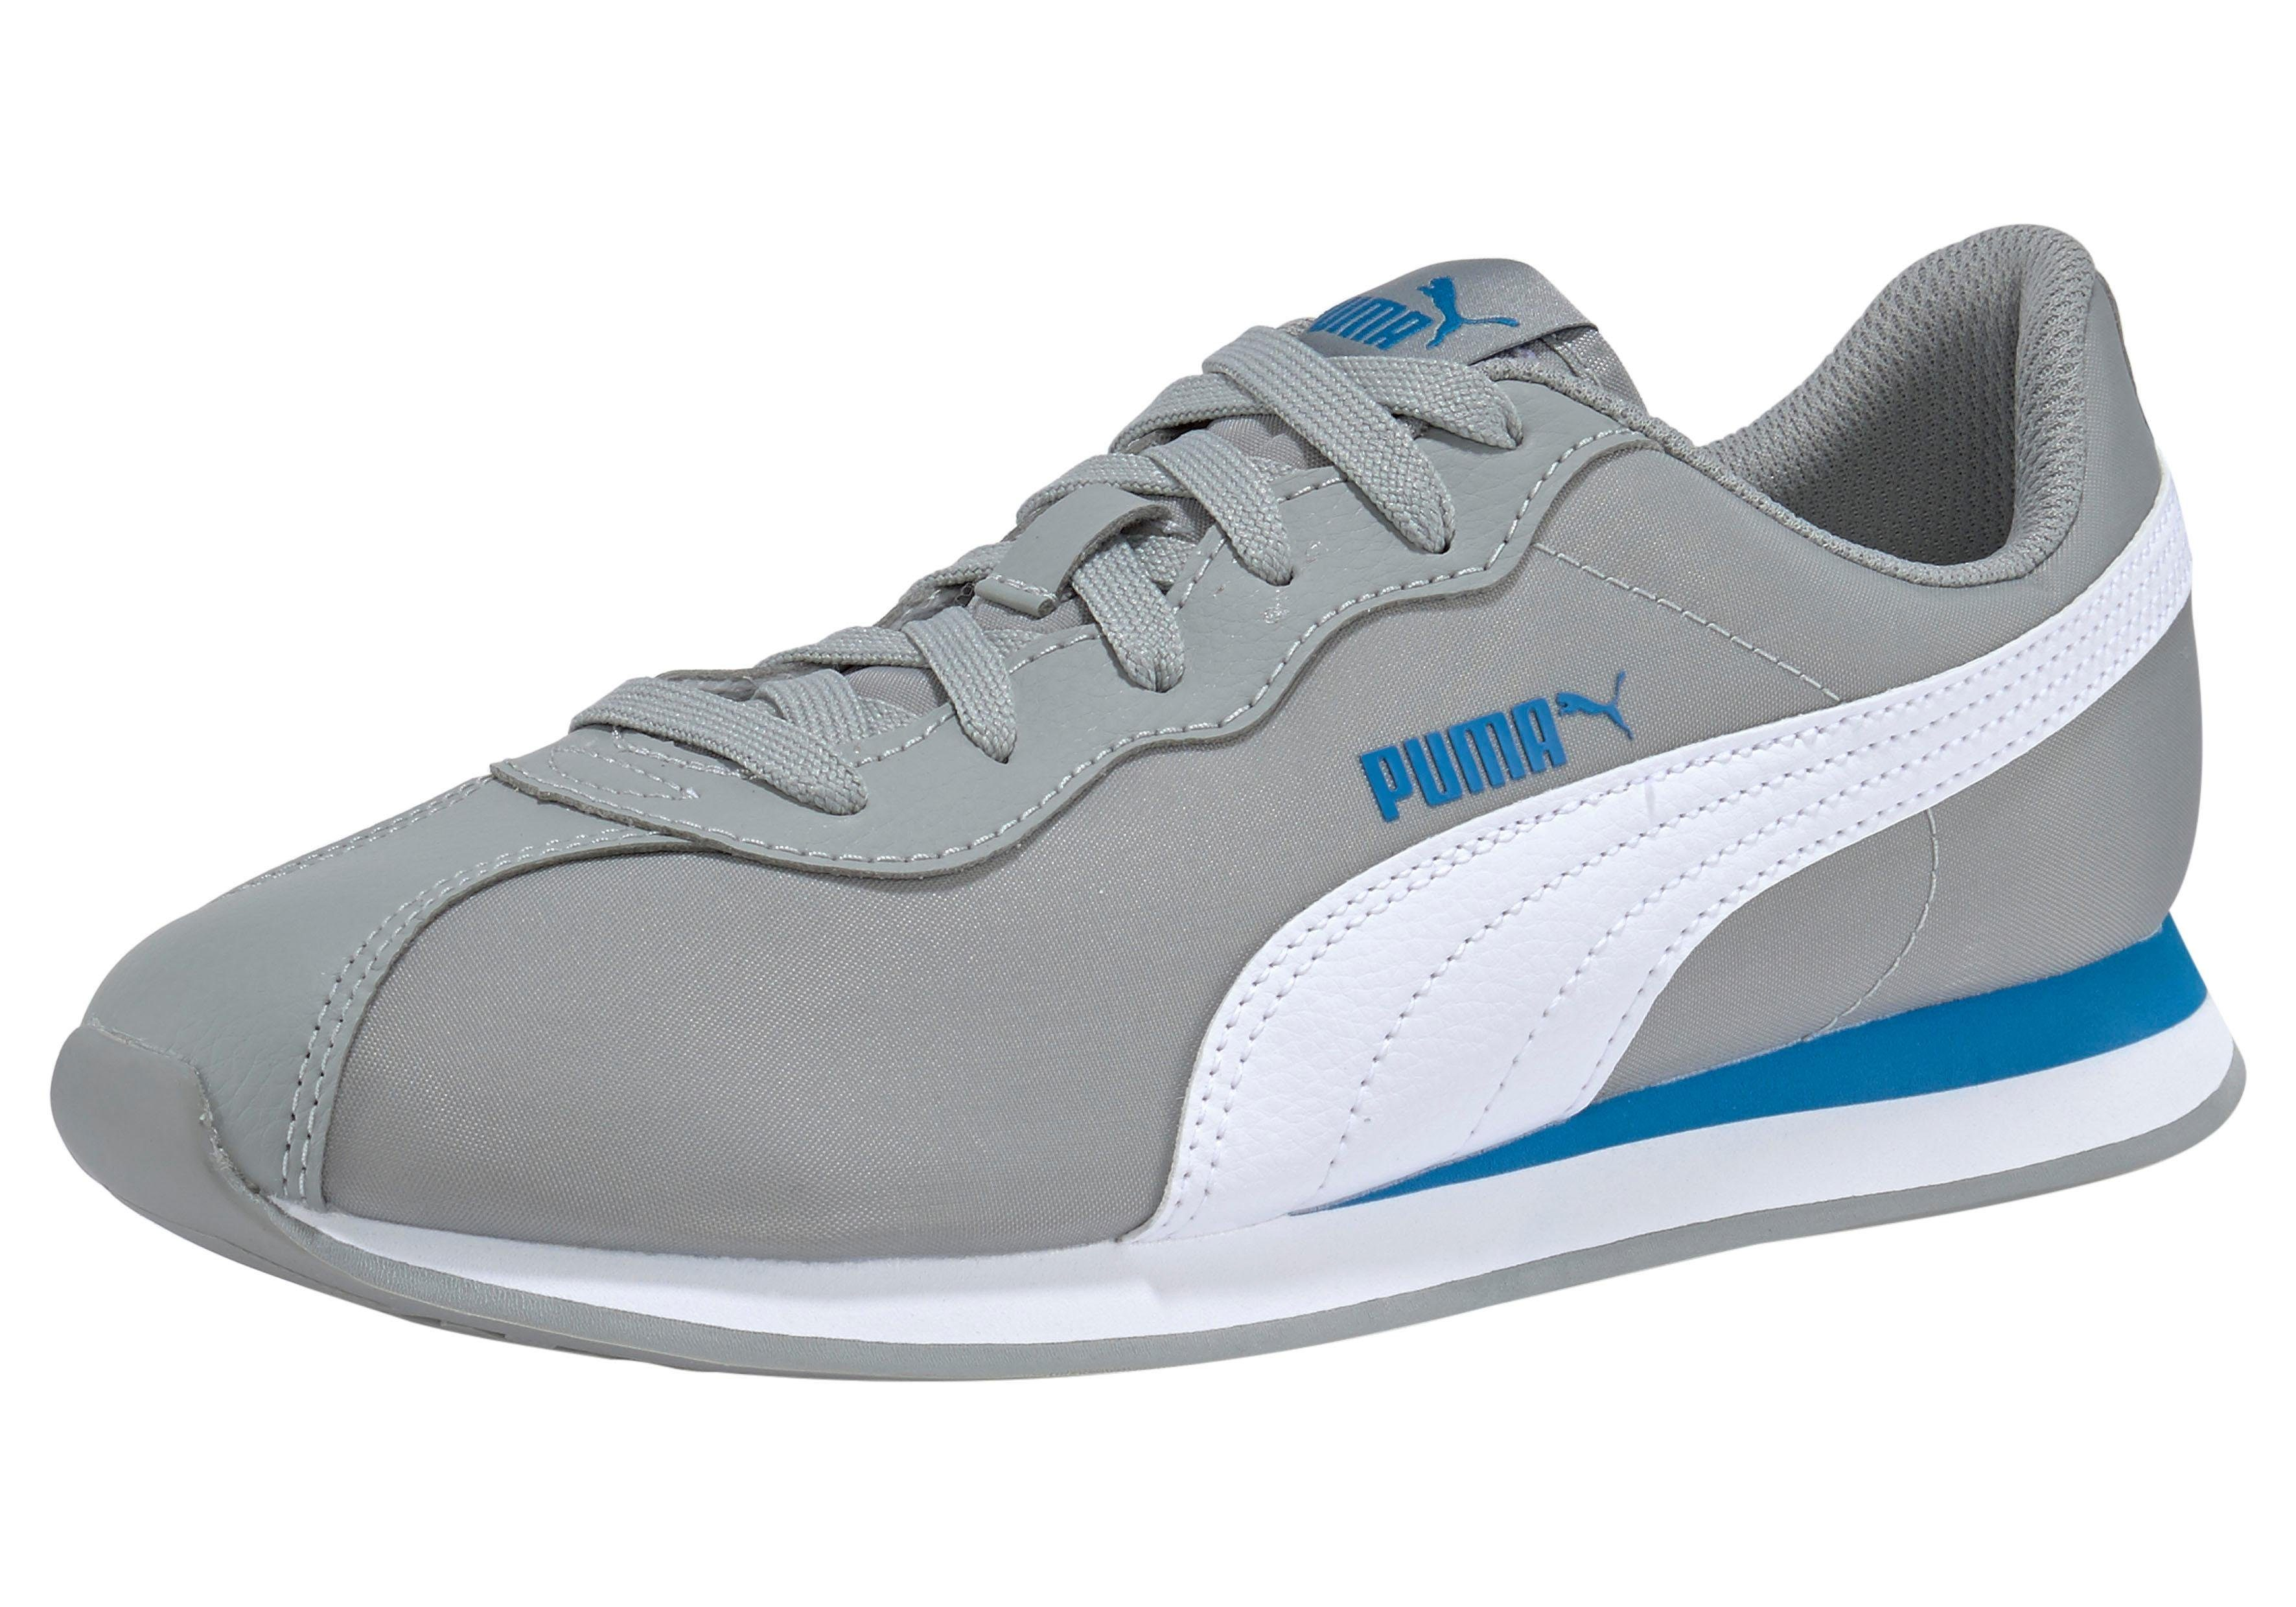 erschwinglich Puma Sneaker Schuhe Damen Puma Wildleder Bow